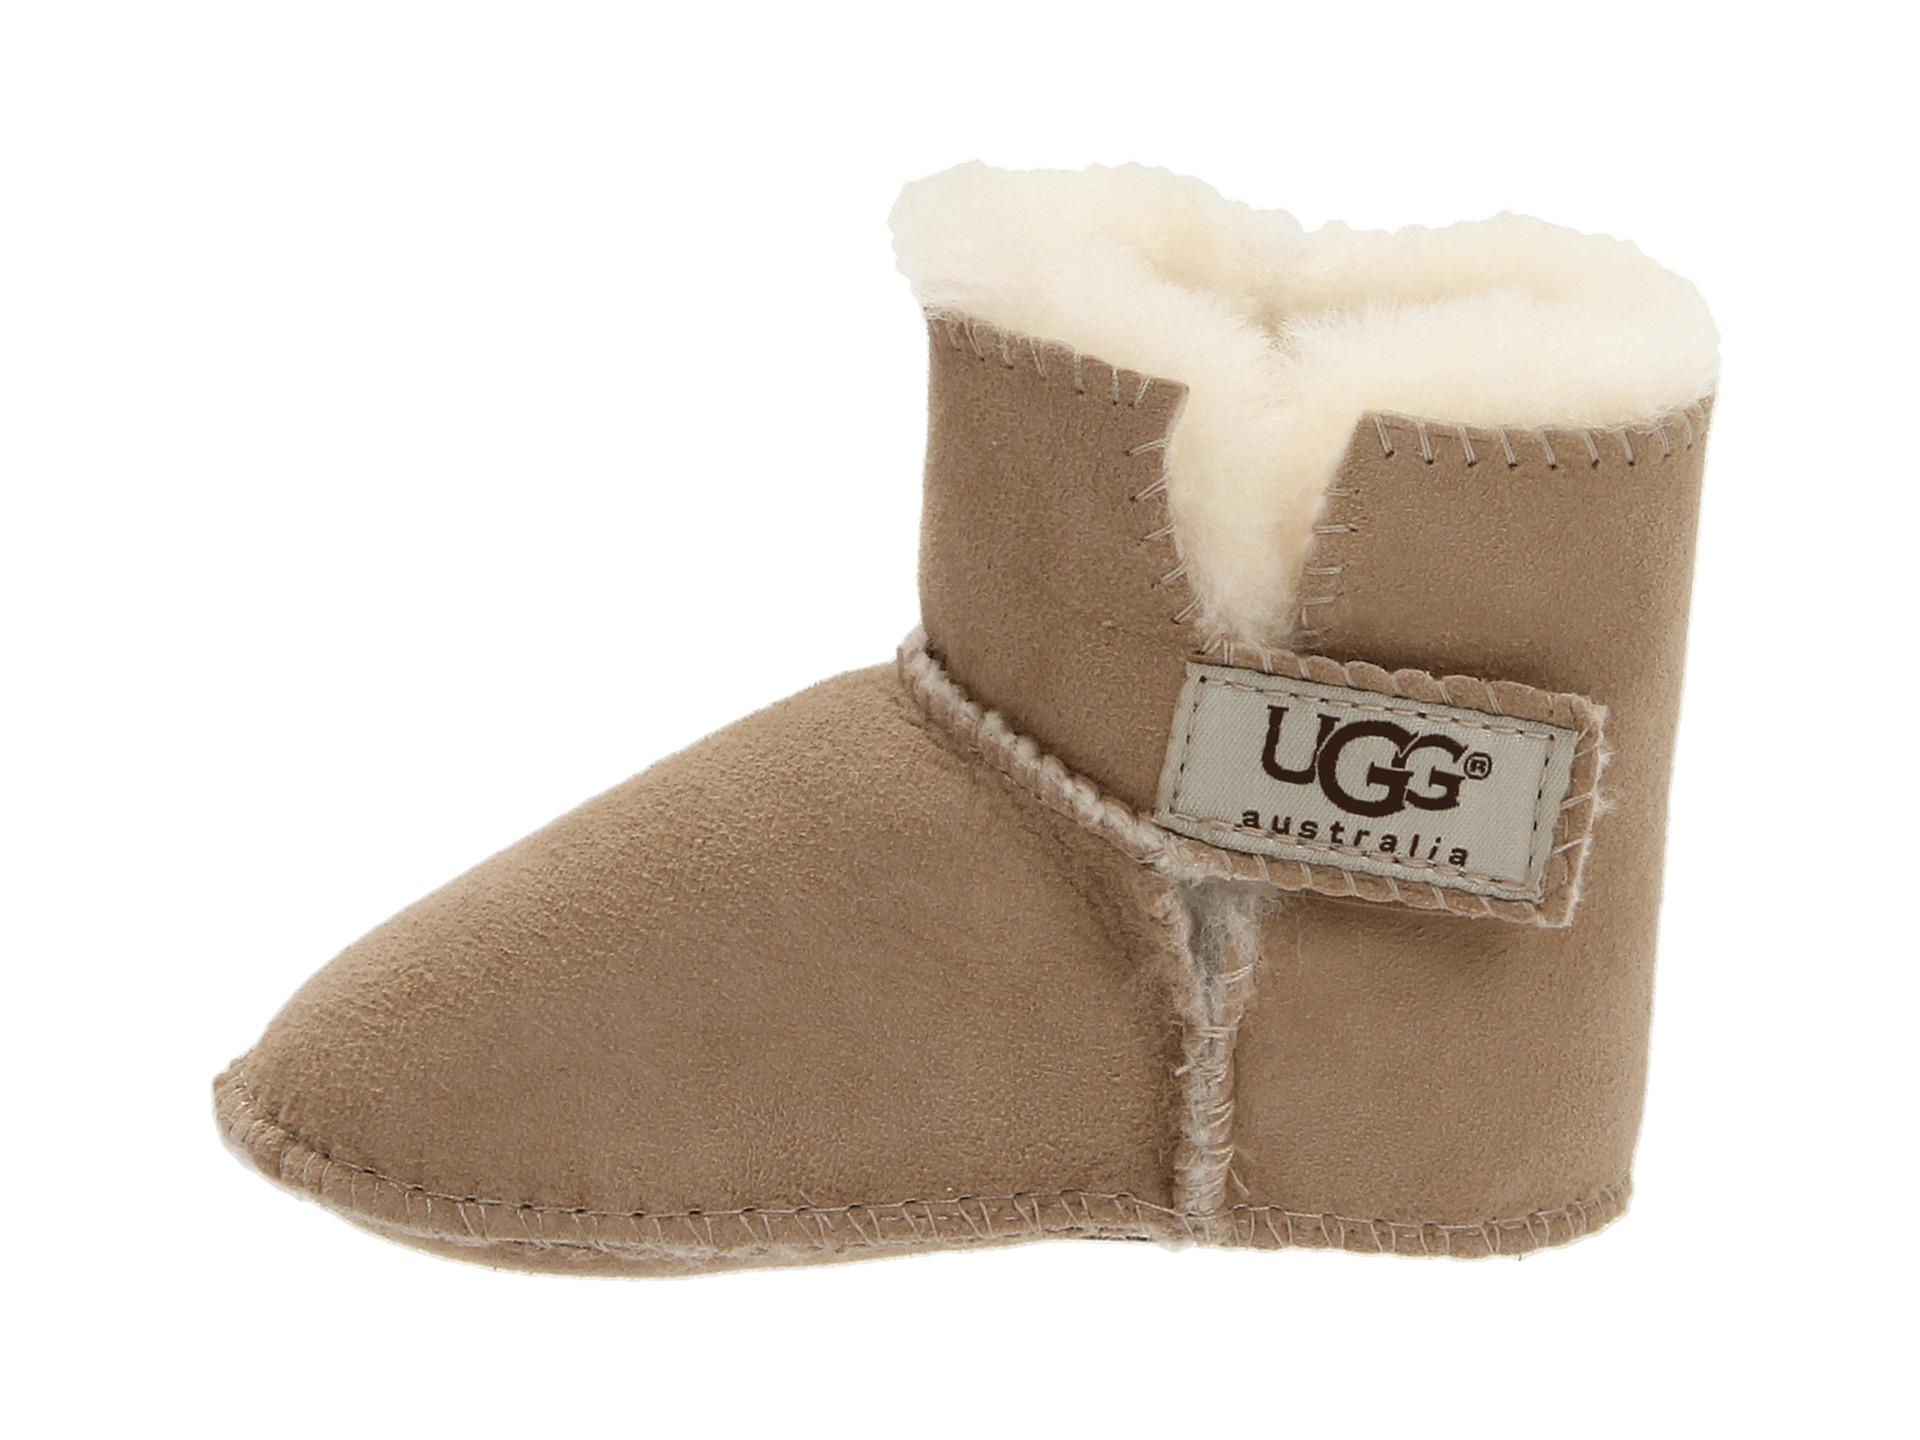 ugg baby size 01